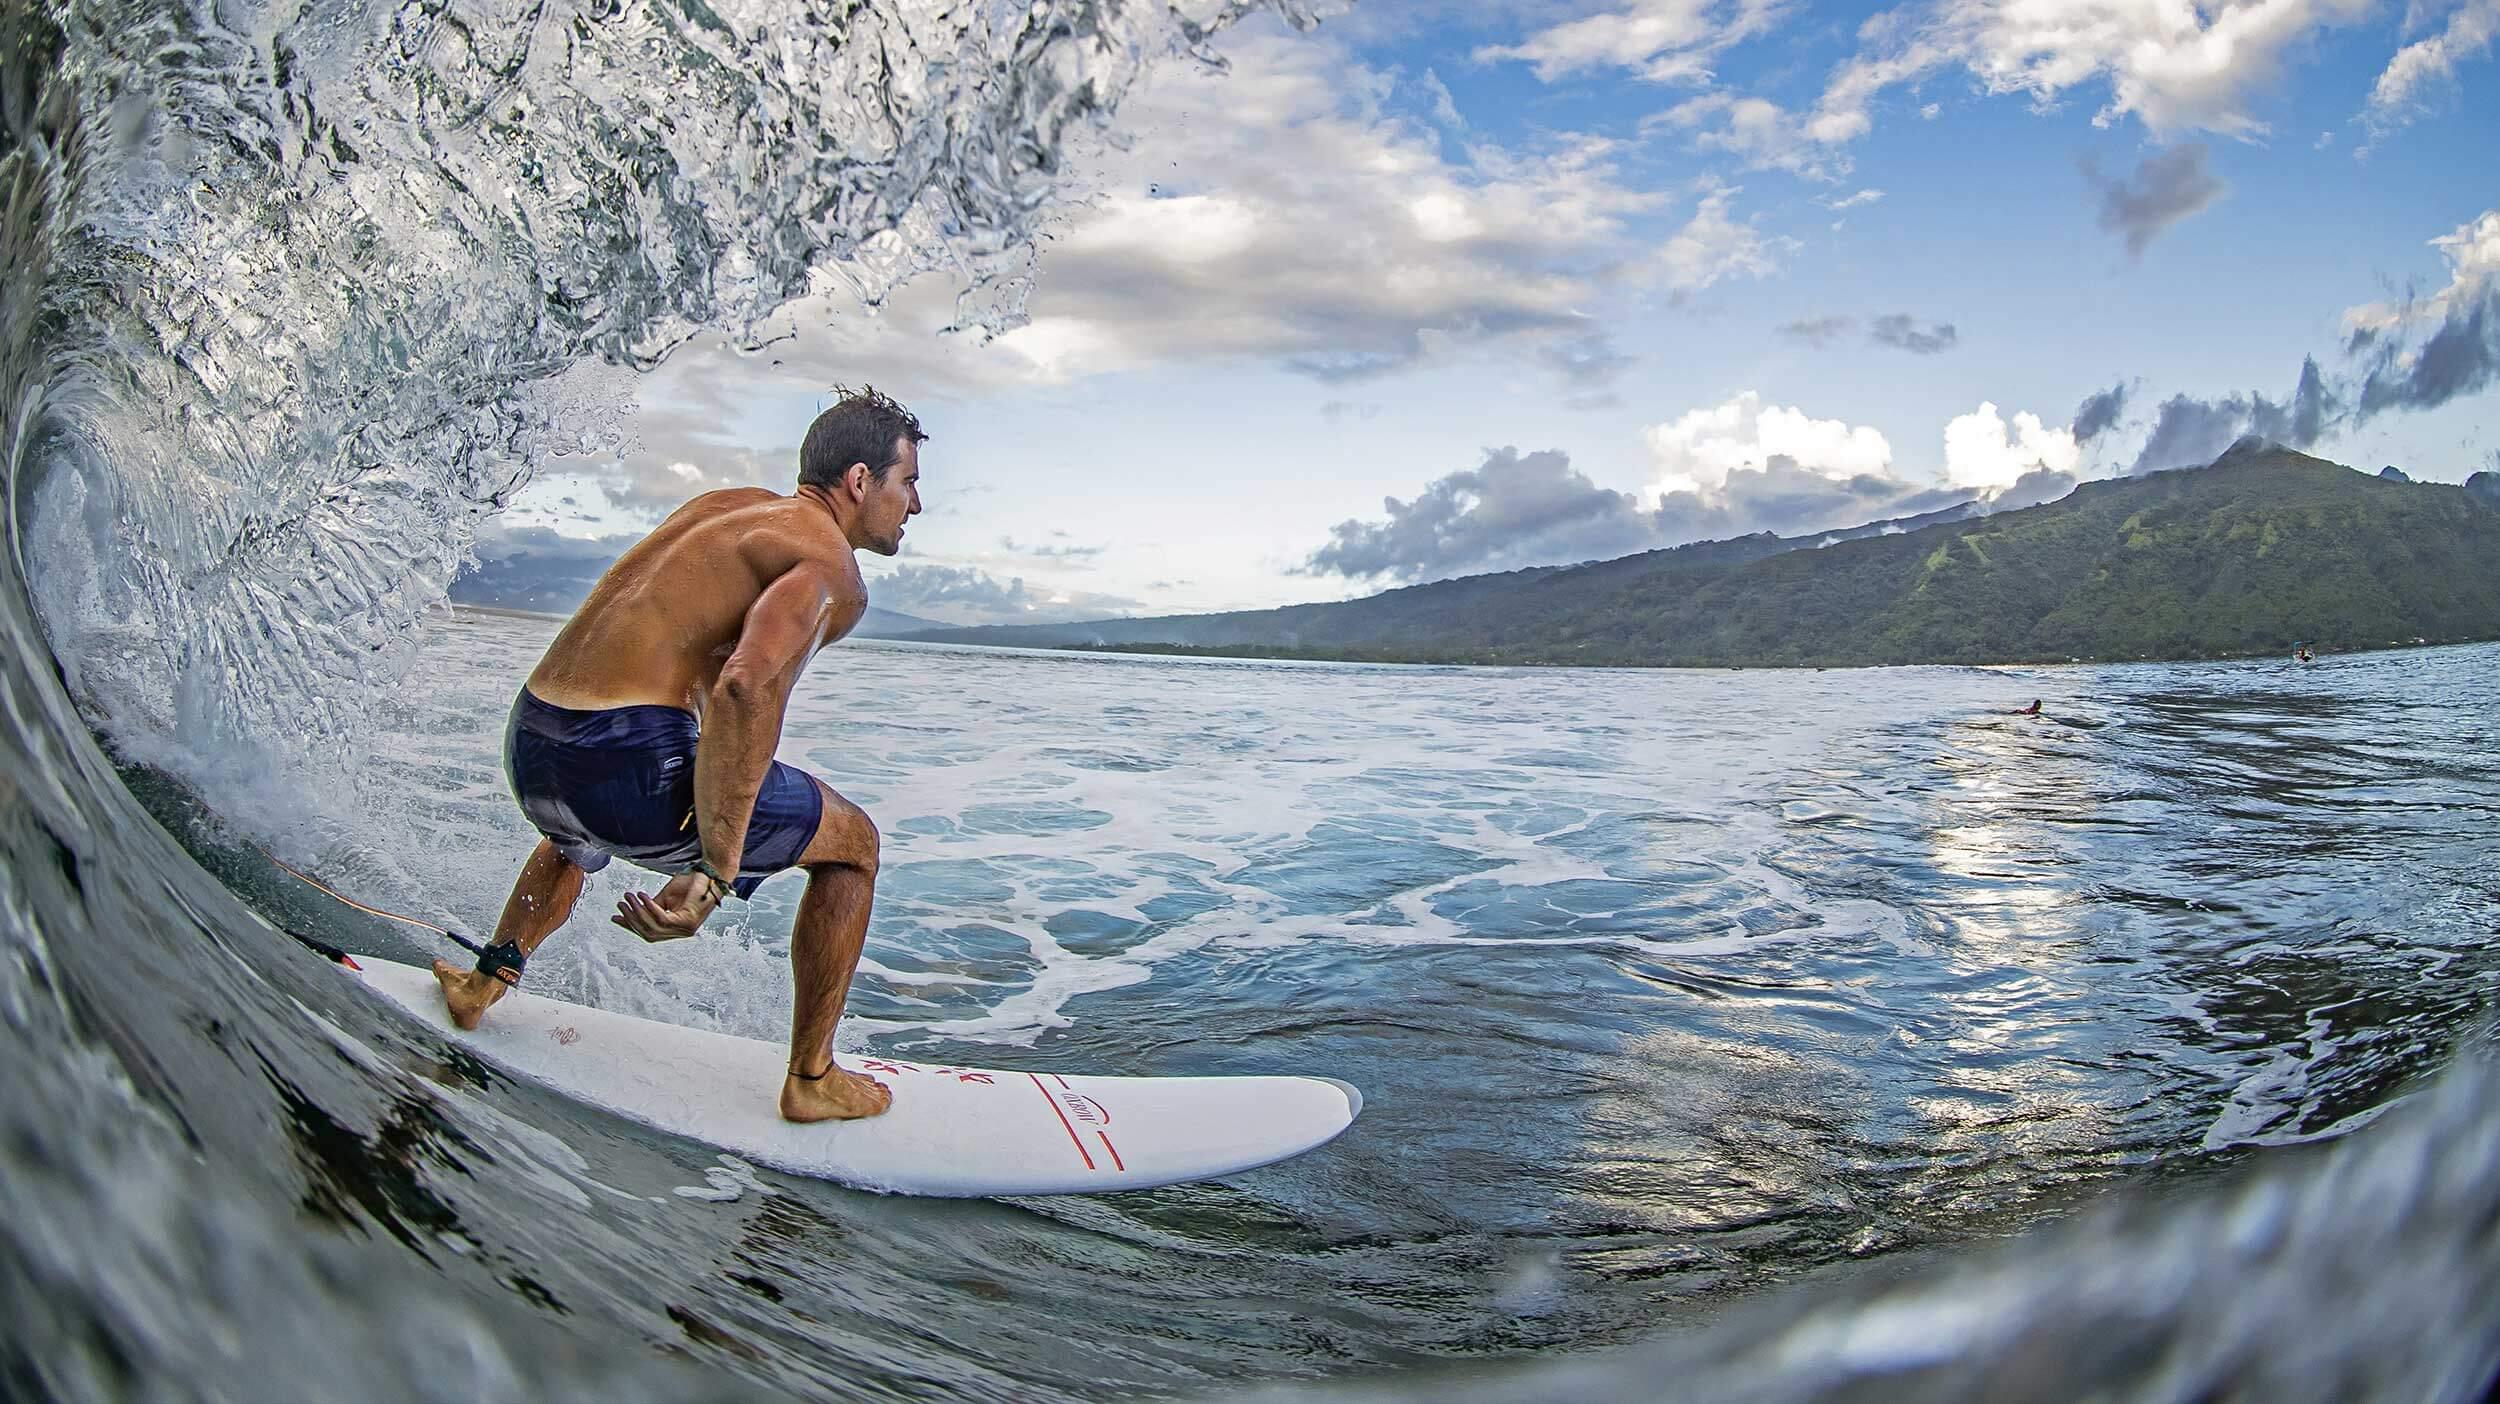 Retro surf series